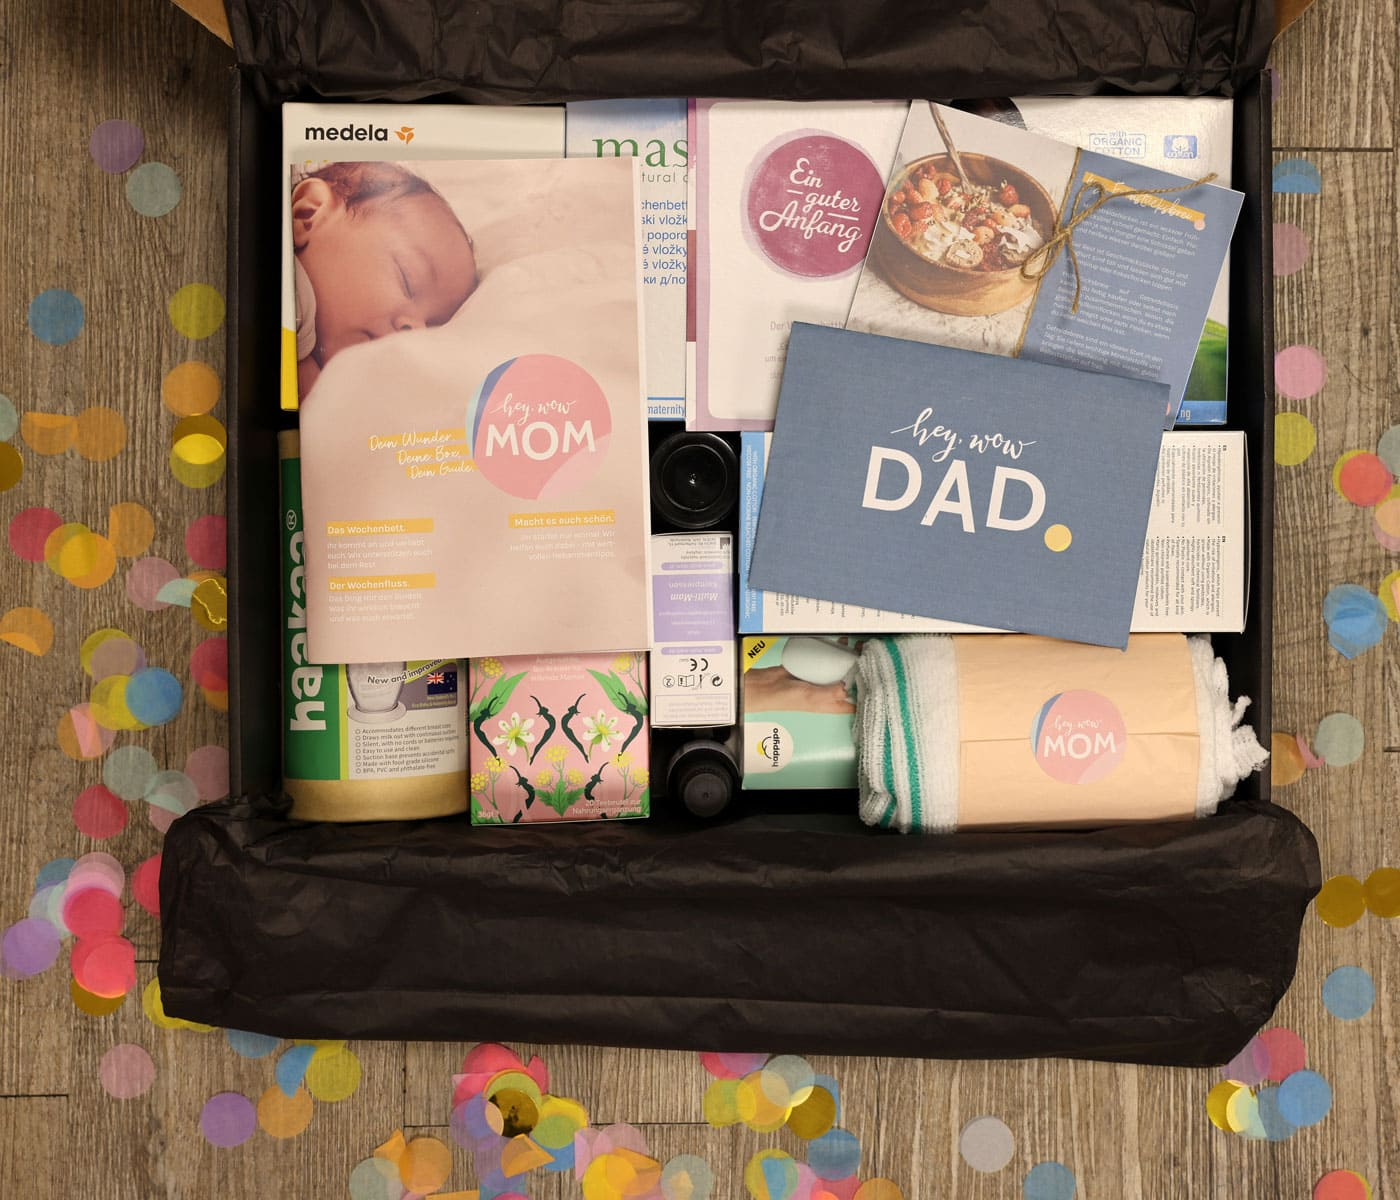 Wochenbett-Box hey WOW MOM // HIMBEER